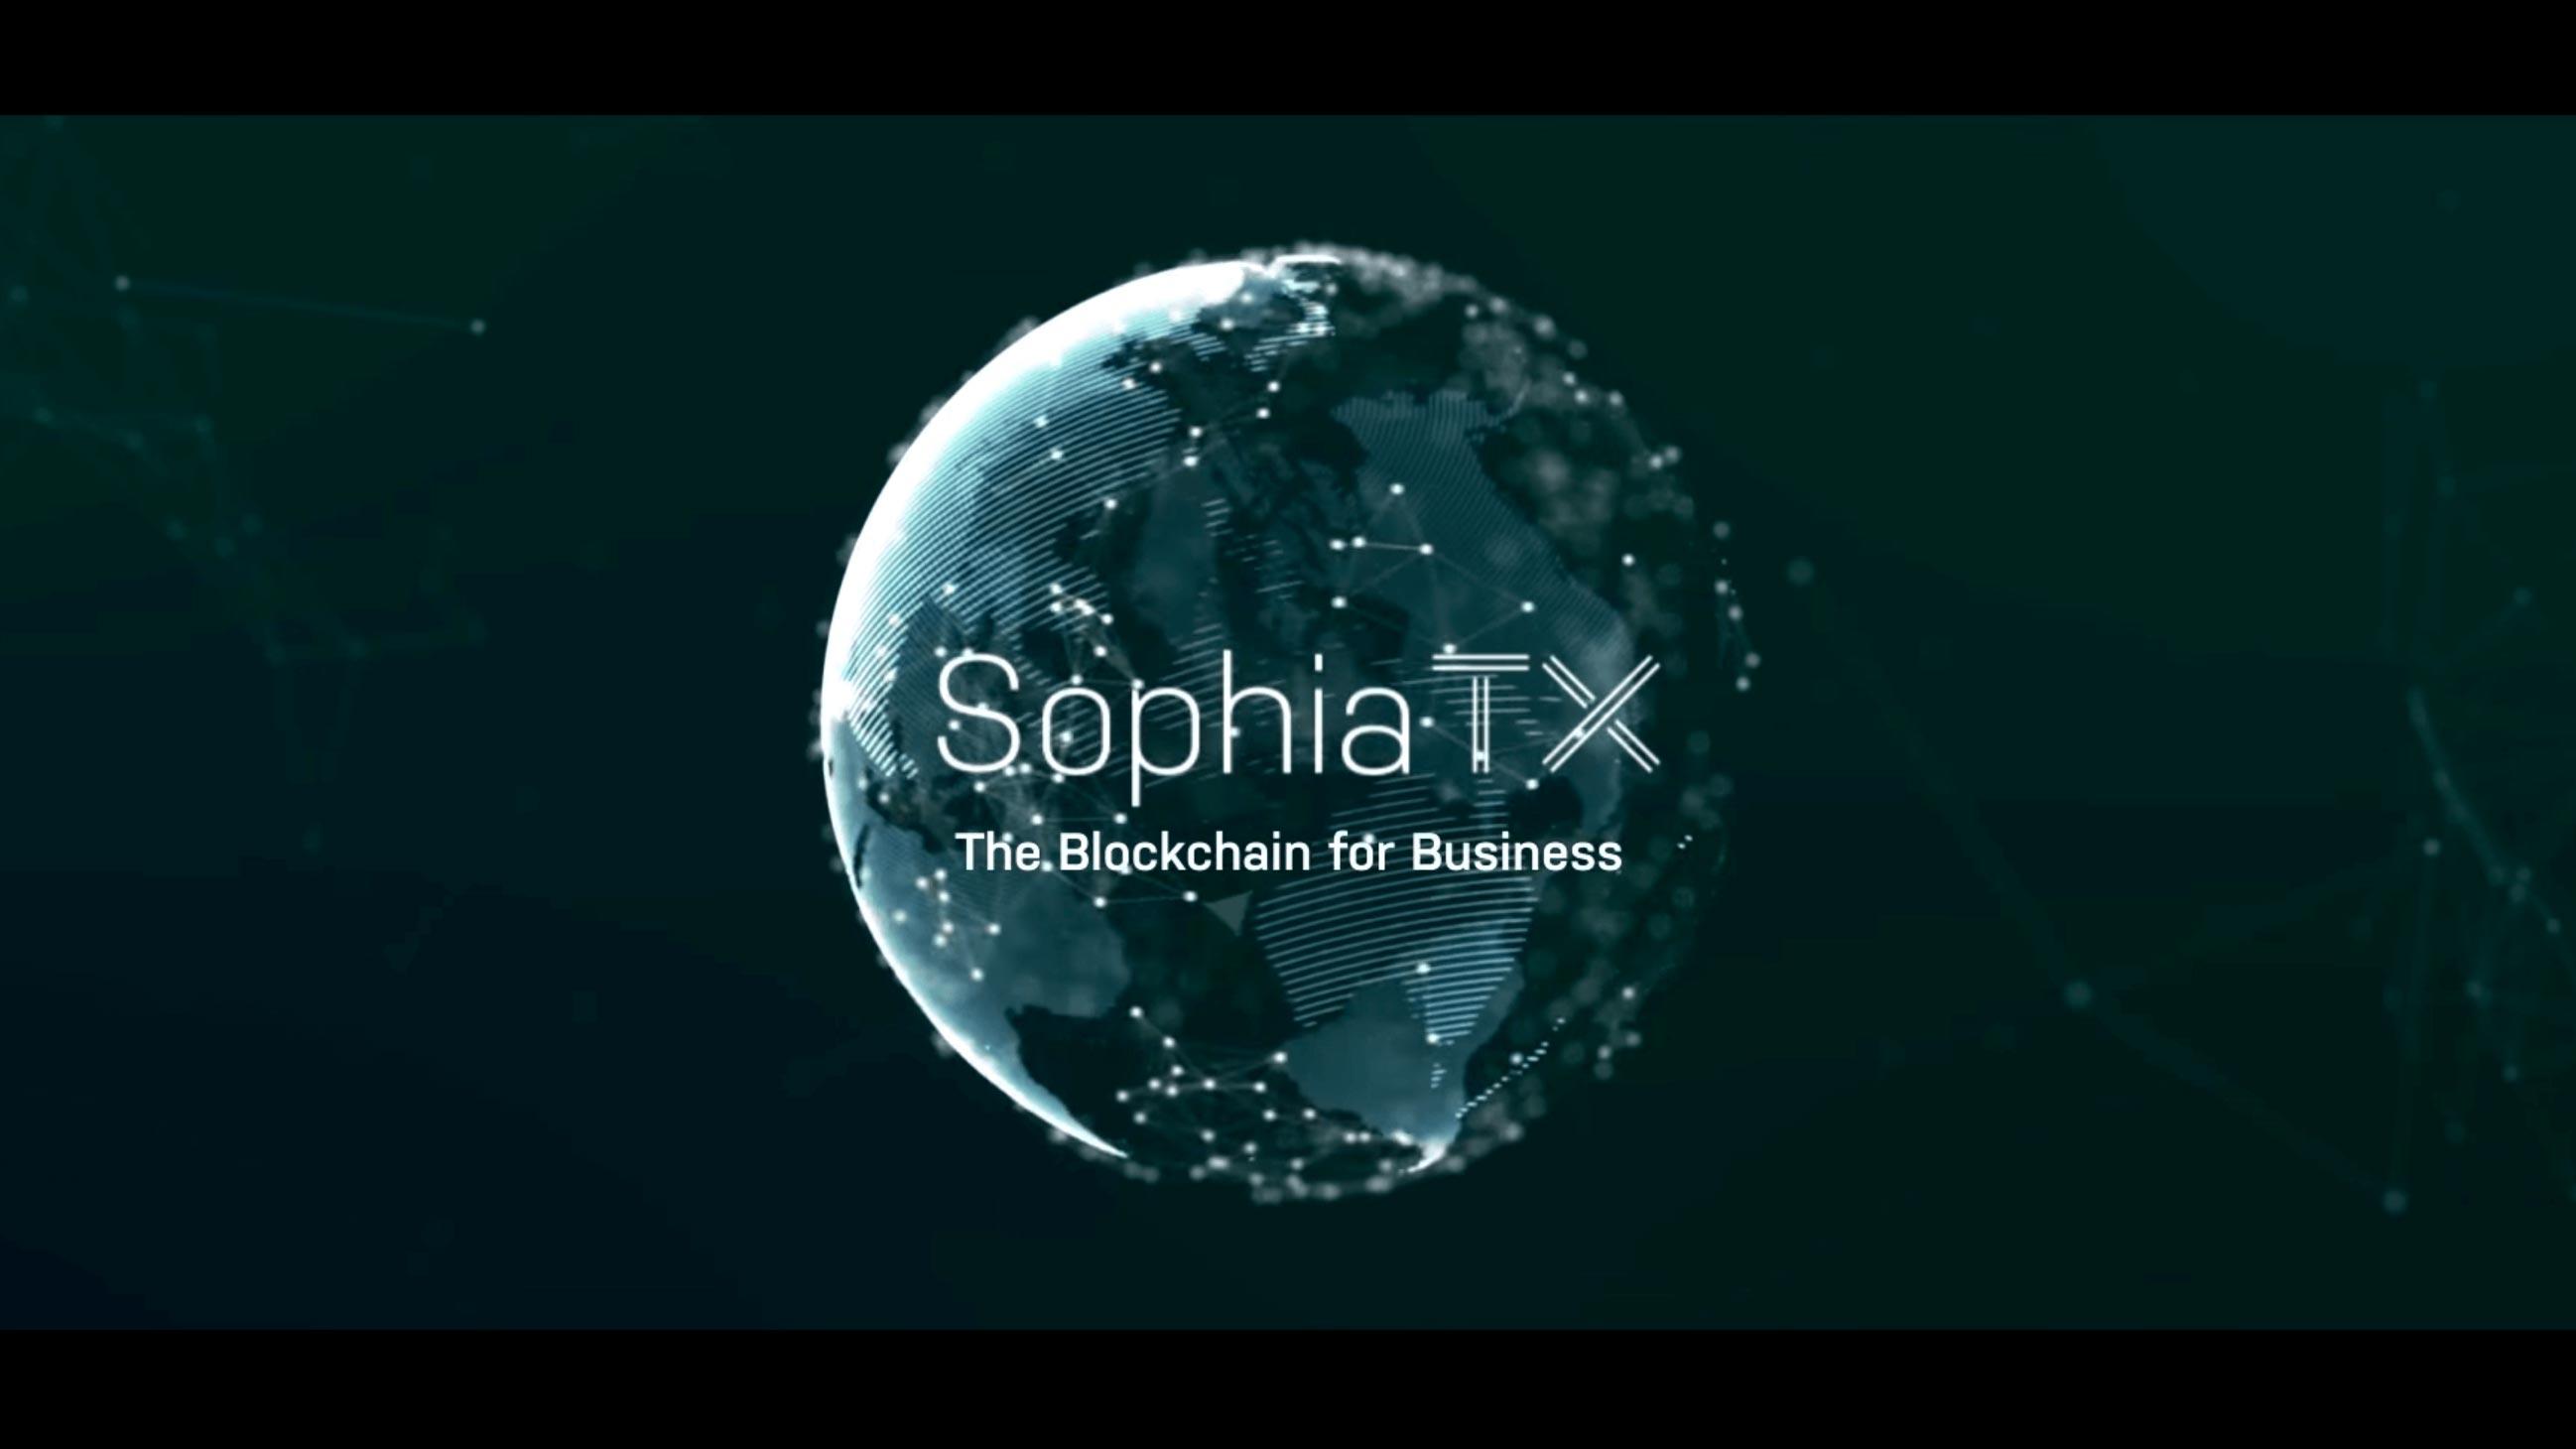 SophiaTX releases Enterprise-Ready Public Blockchain